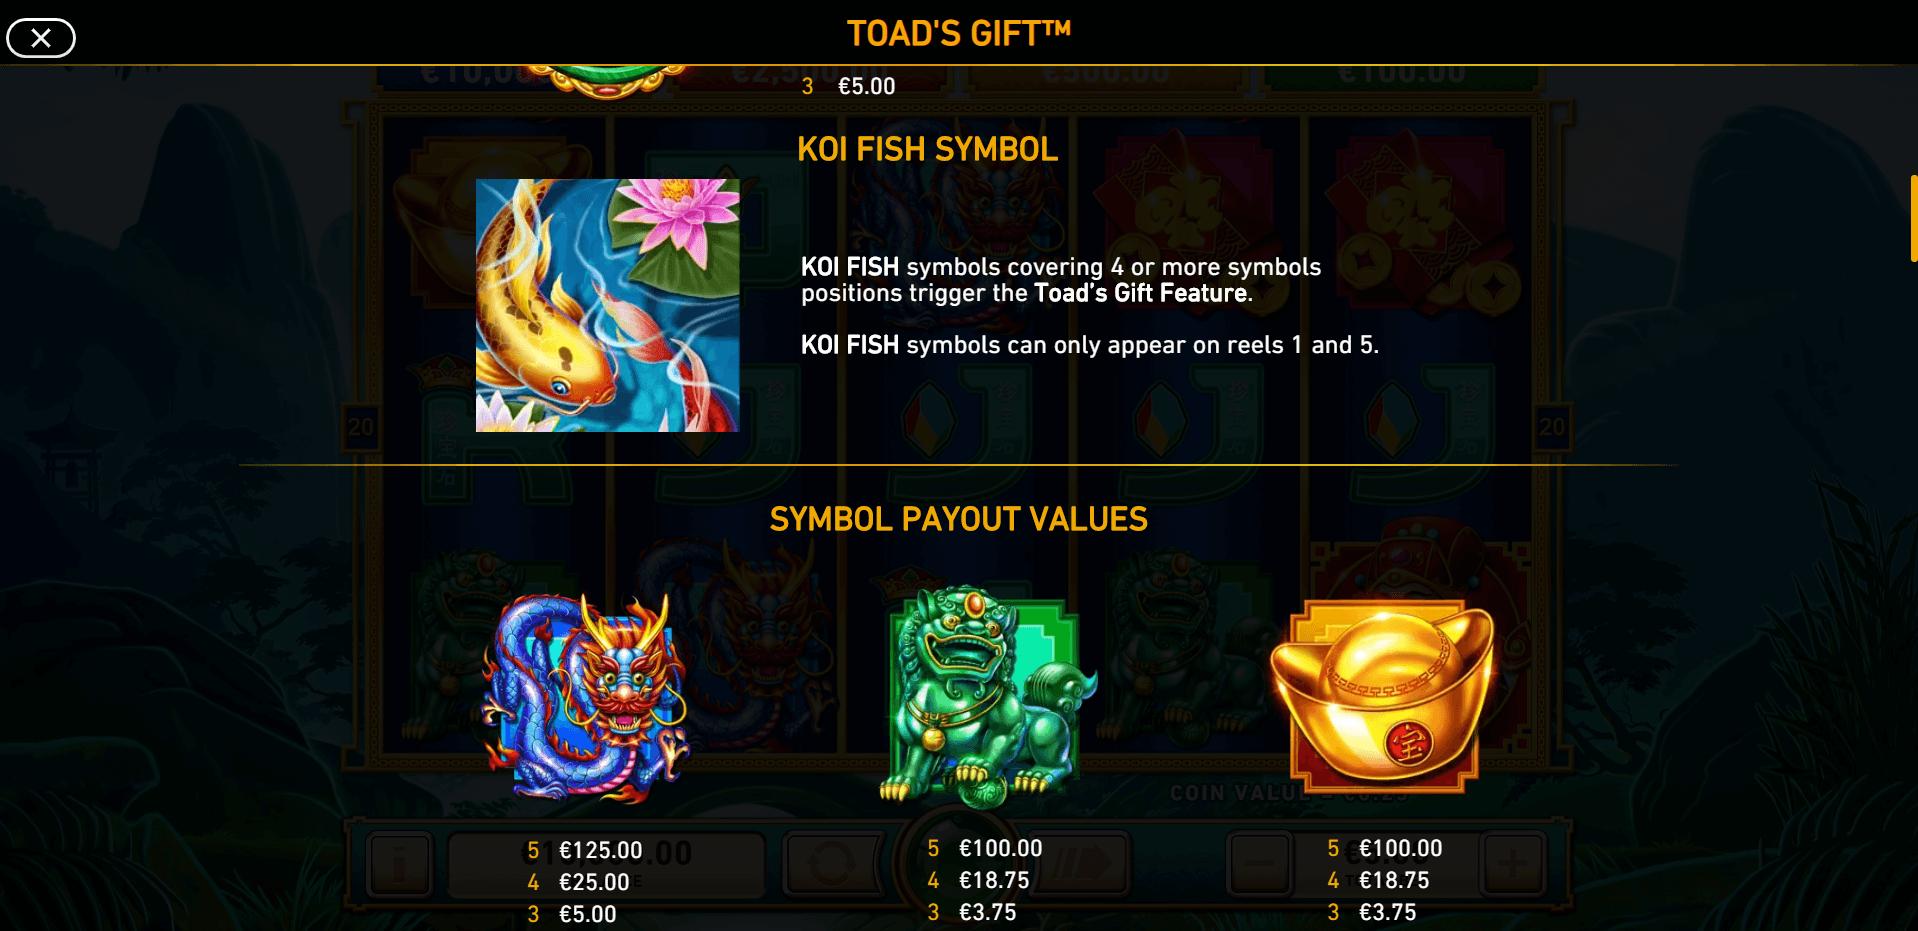 Toads Gift Slot Machine